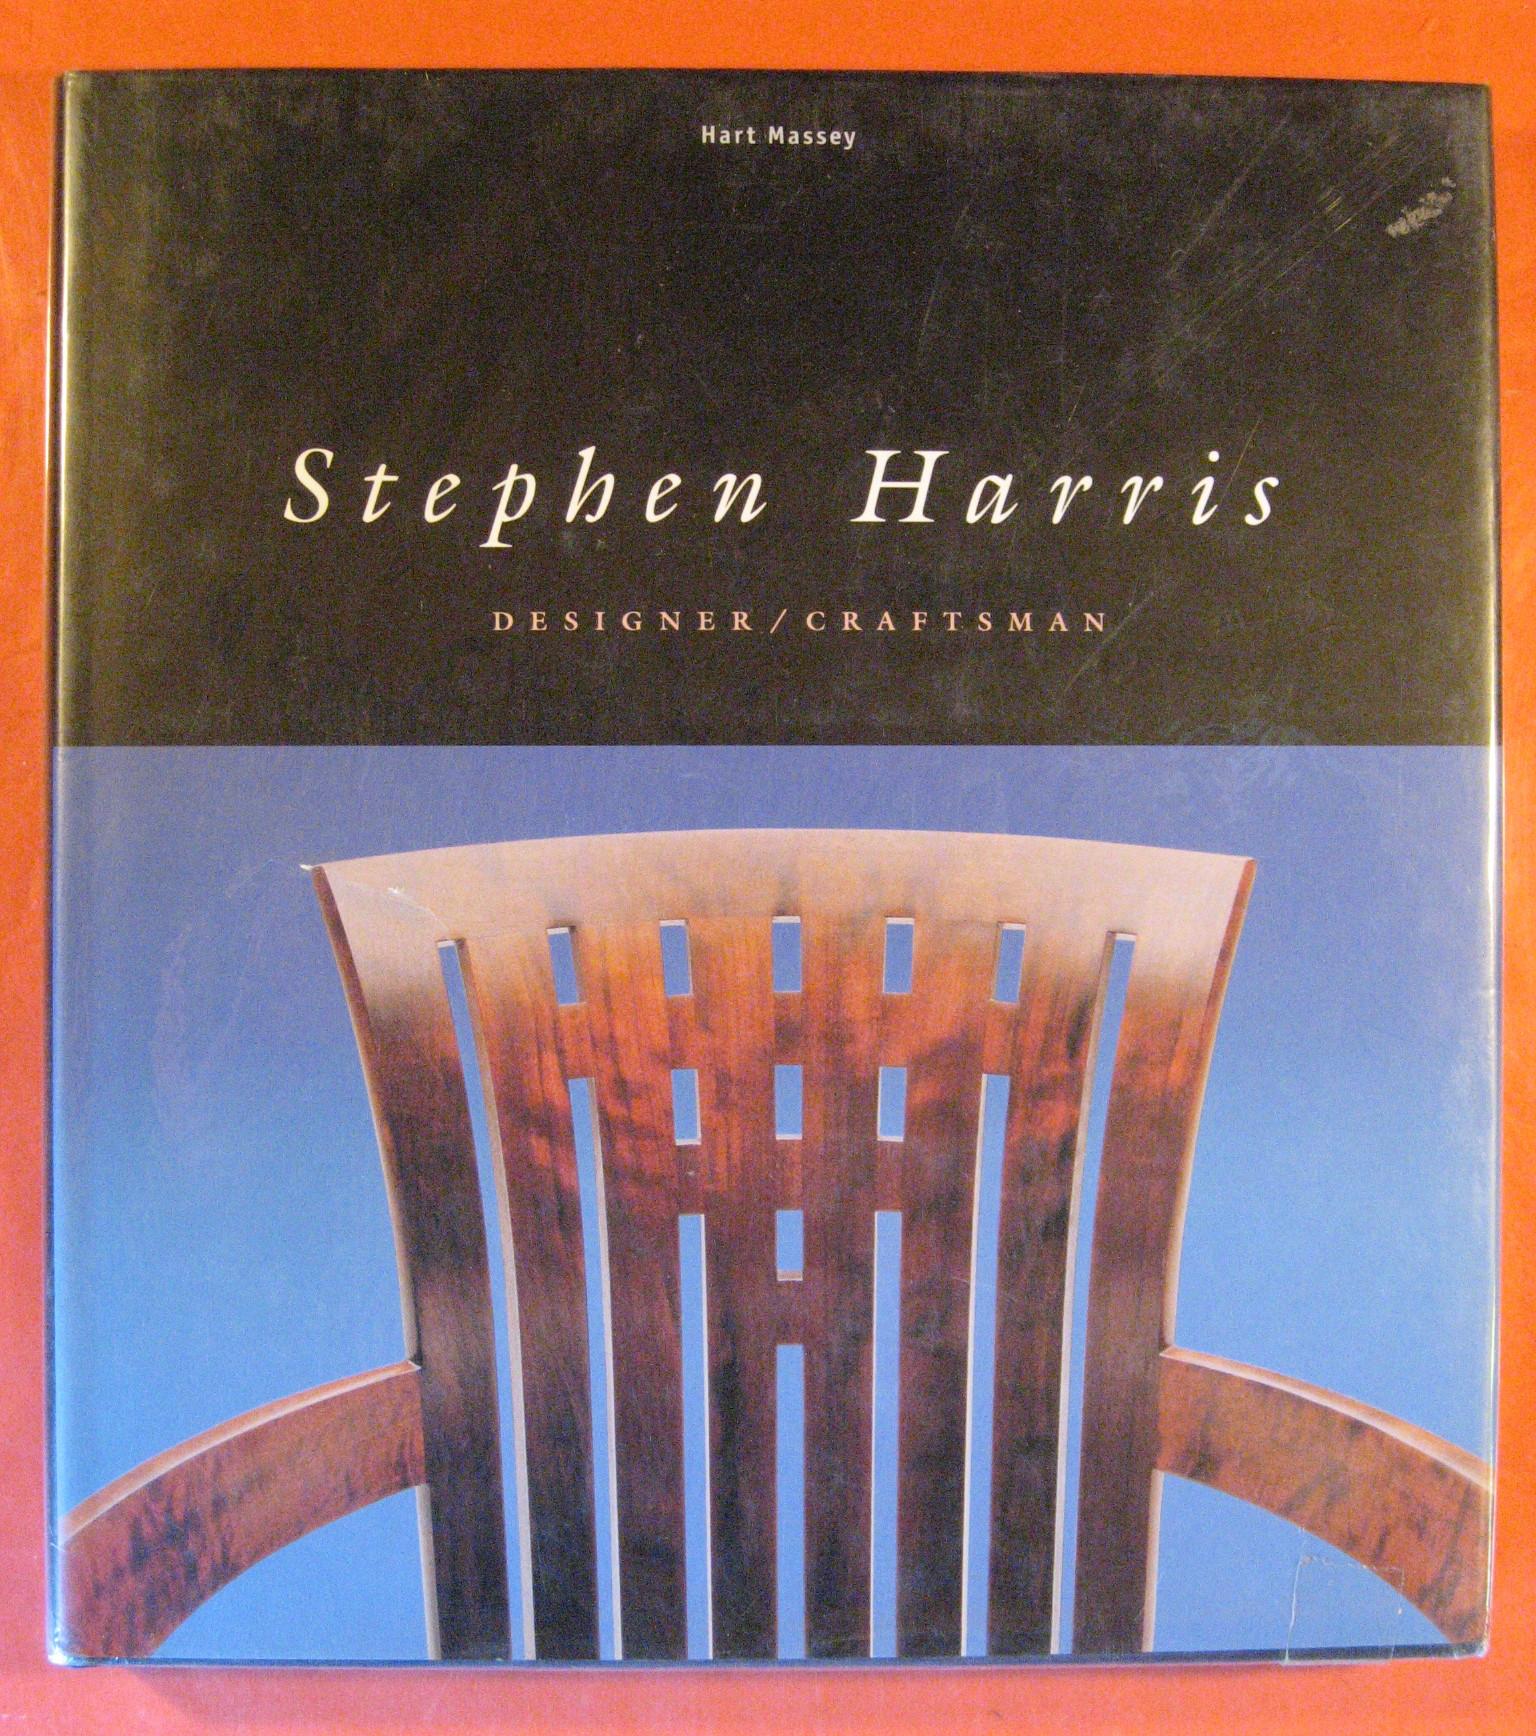 Stephen Harris: Designer, Craftsman, Massey, Hart